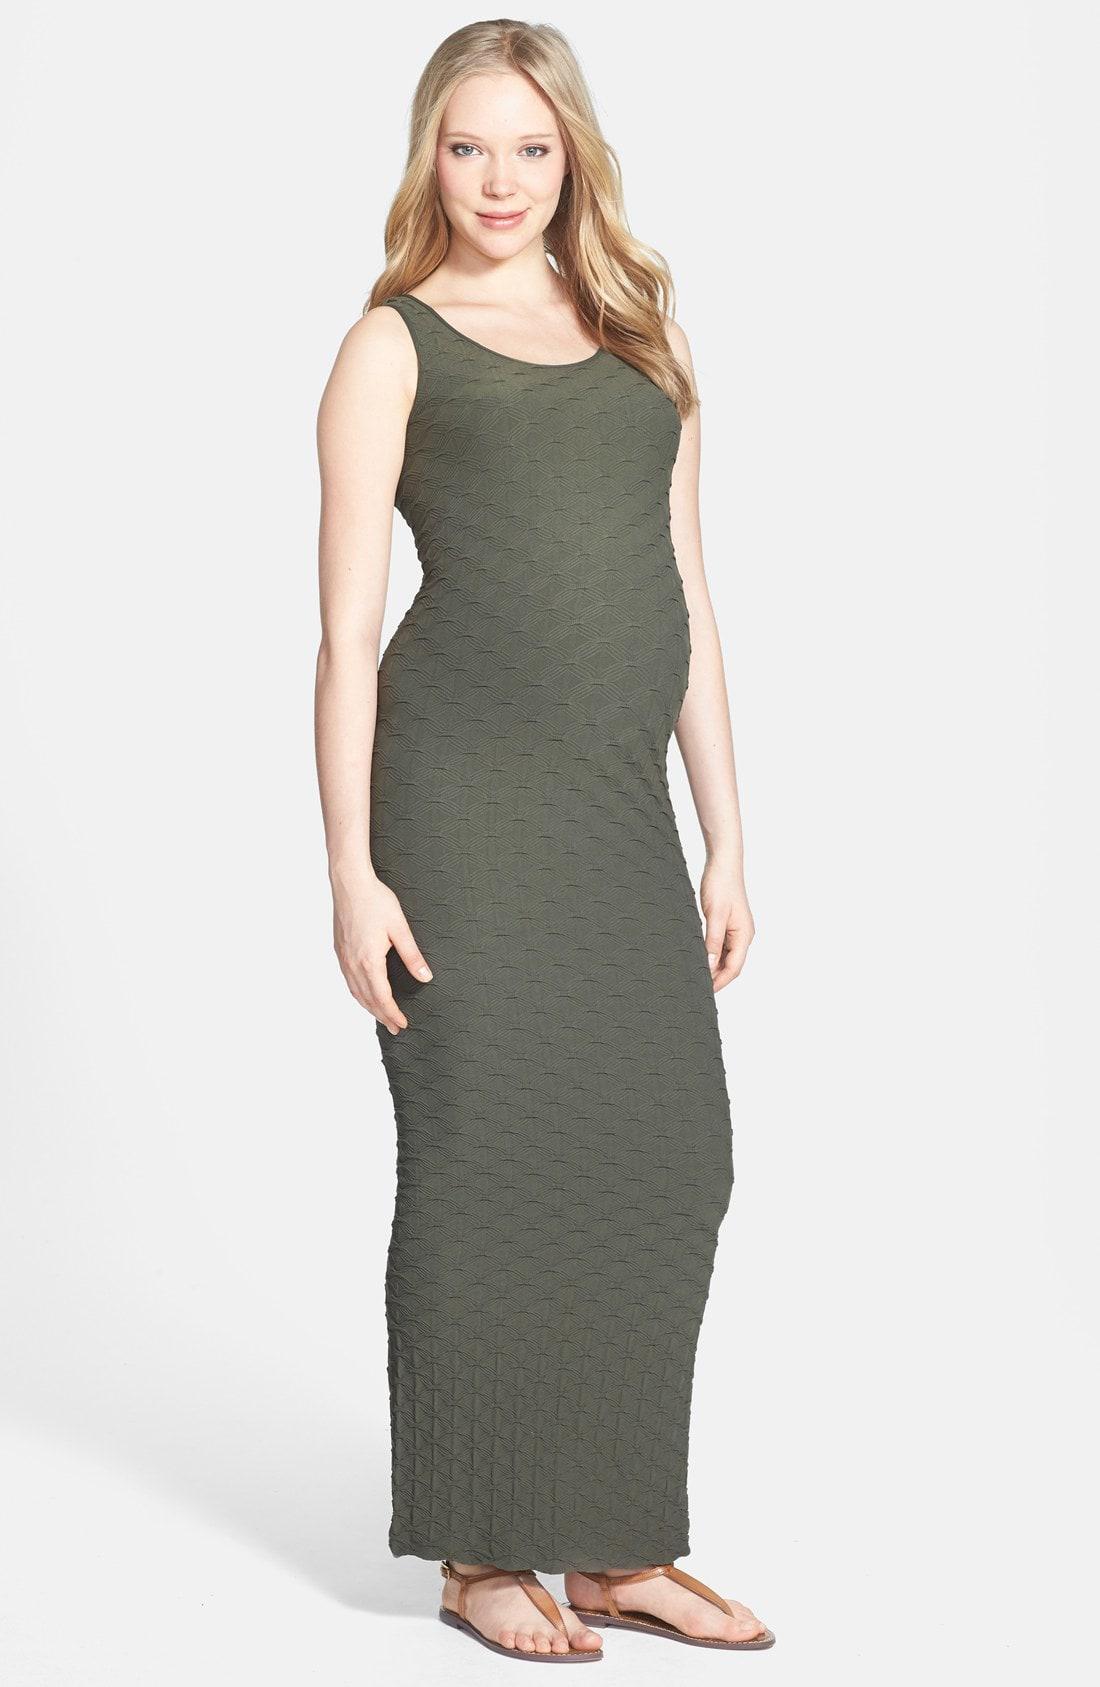 d1530f178c576 Maternity Evening Dresses Nordstrom